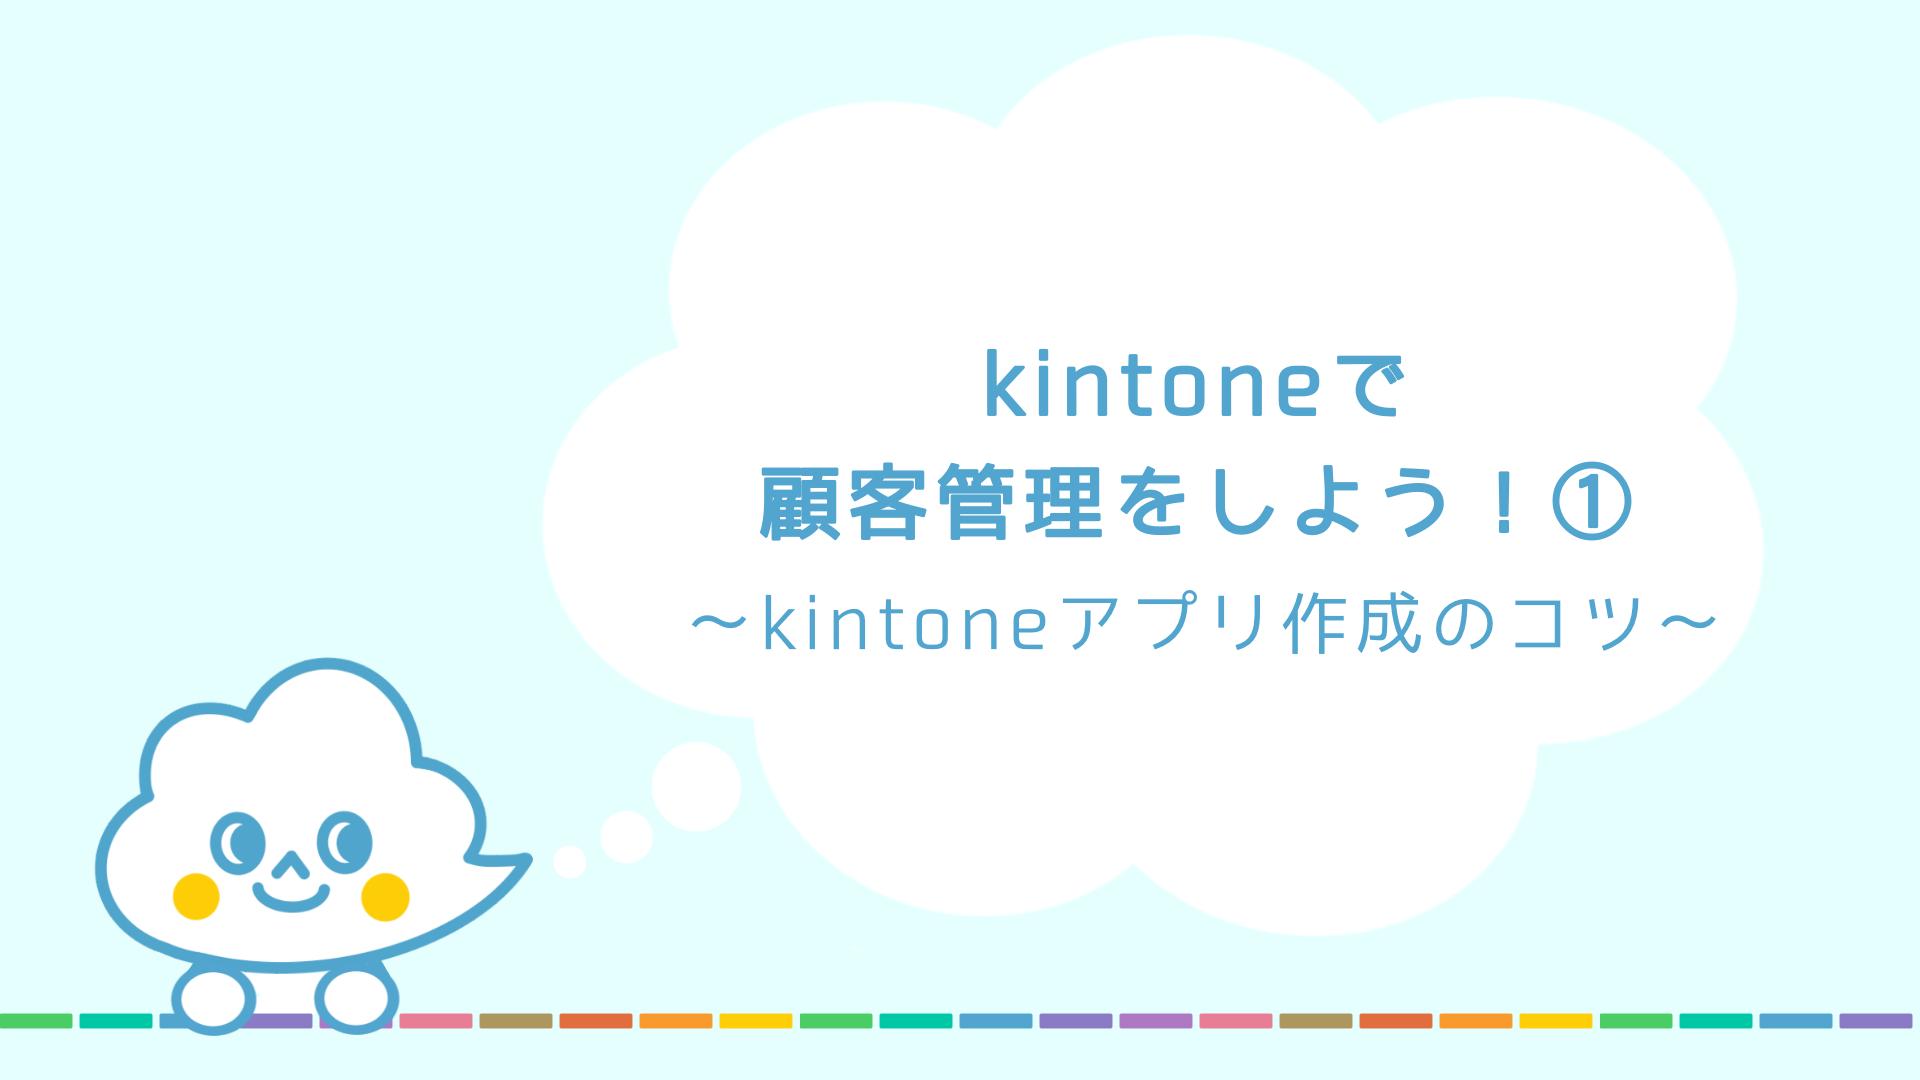 kintoneで顧客管理をしよう!①〜kintoneアプリ作成のコツ〜